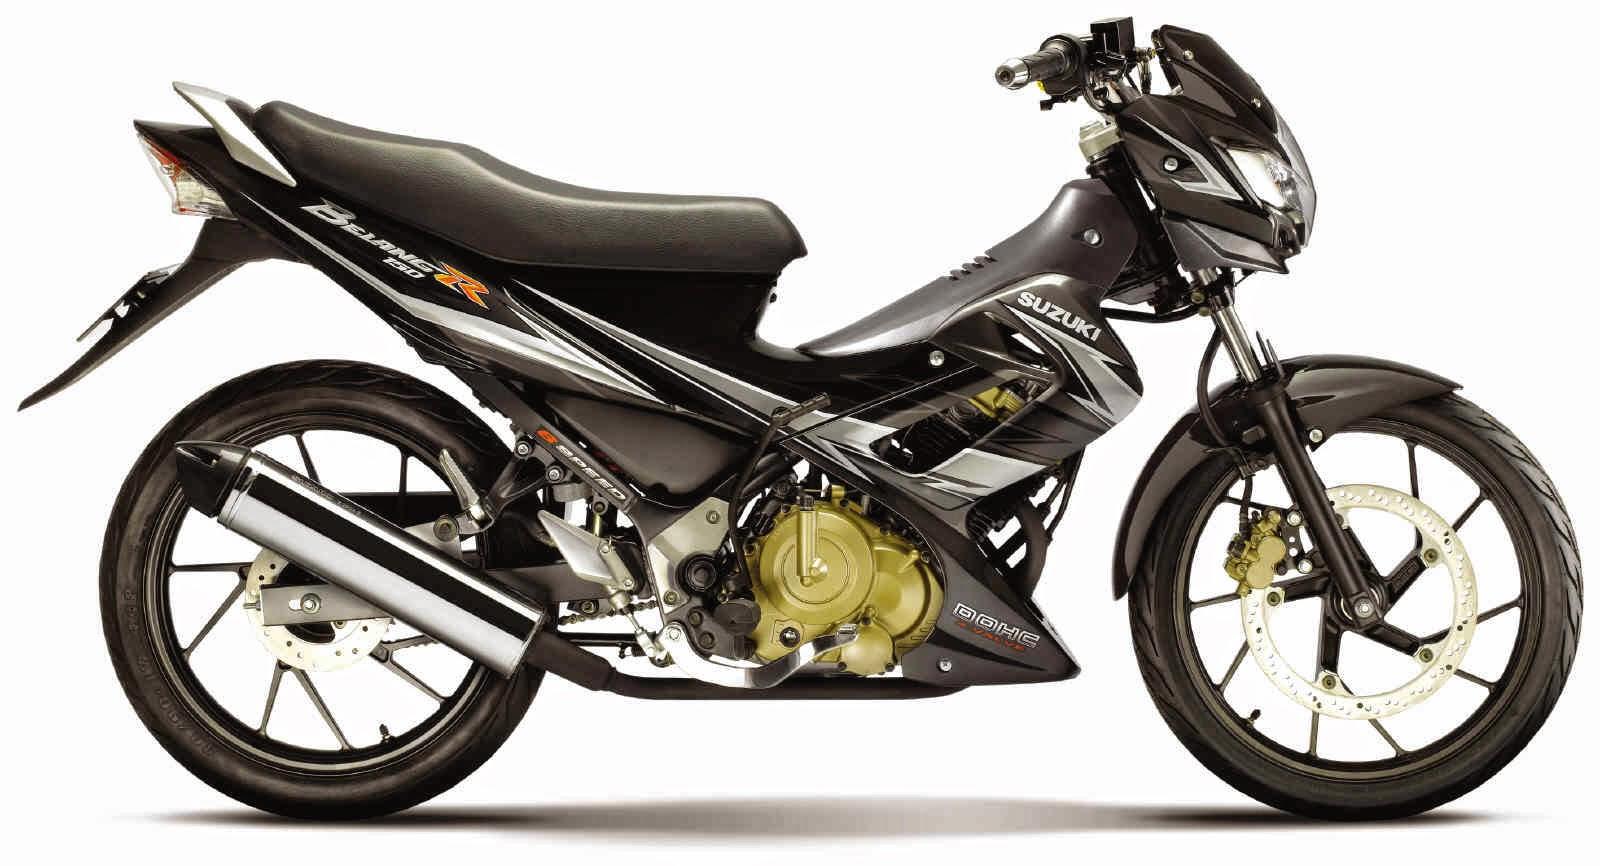 Daftar Harga Cicilan Kredit Motor Suzuki Terbaru 2014